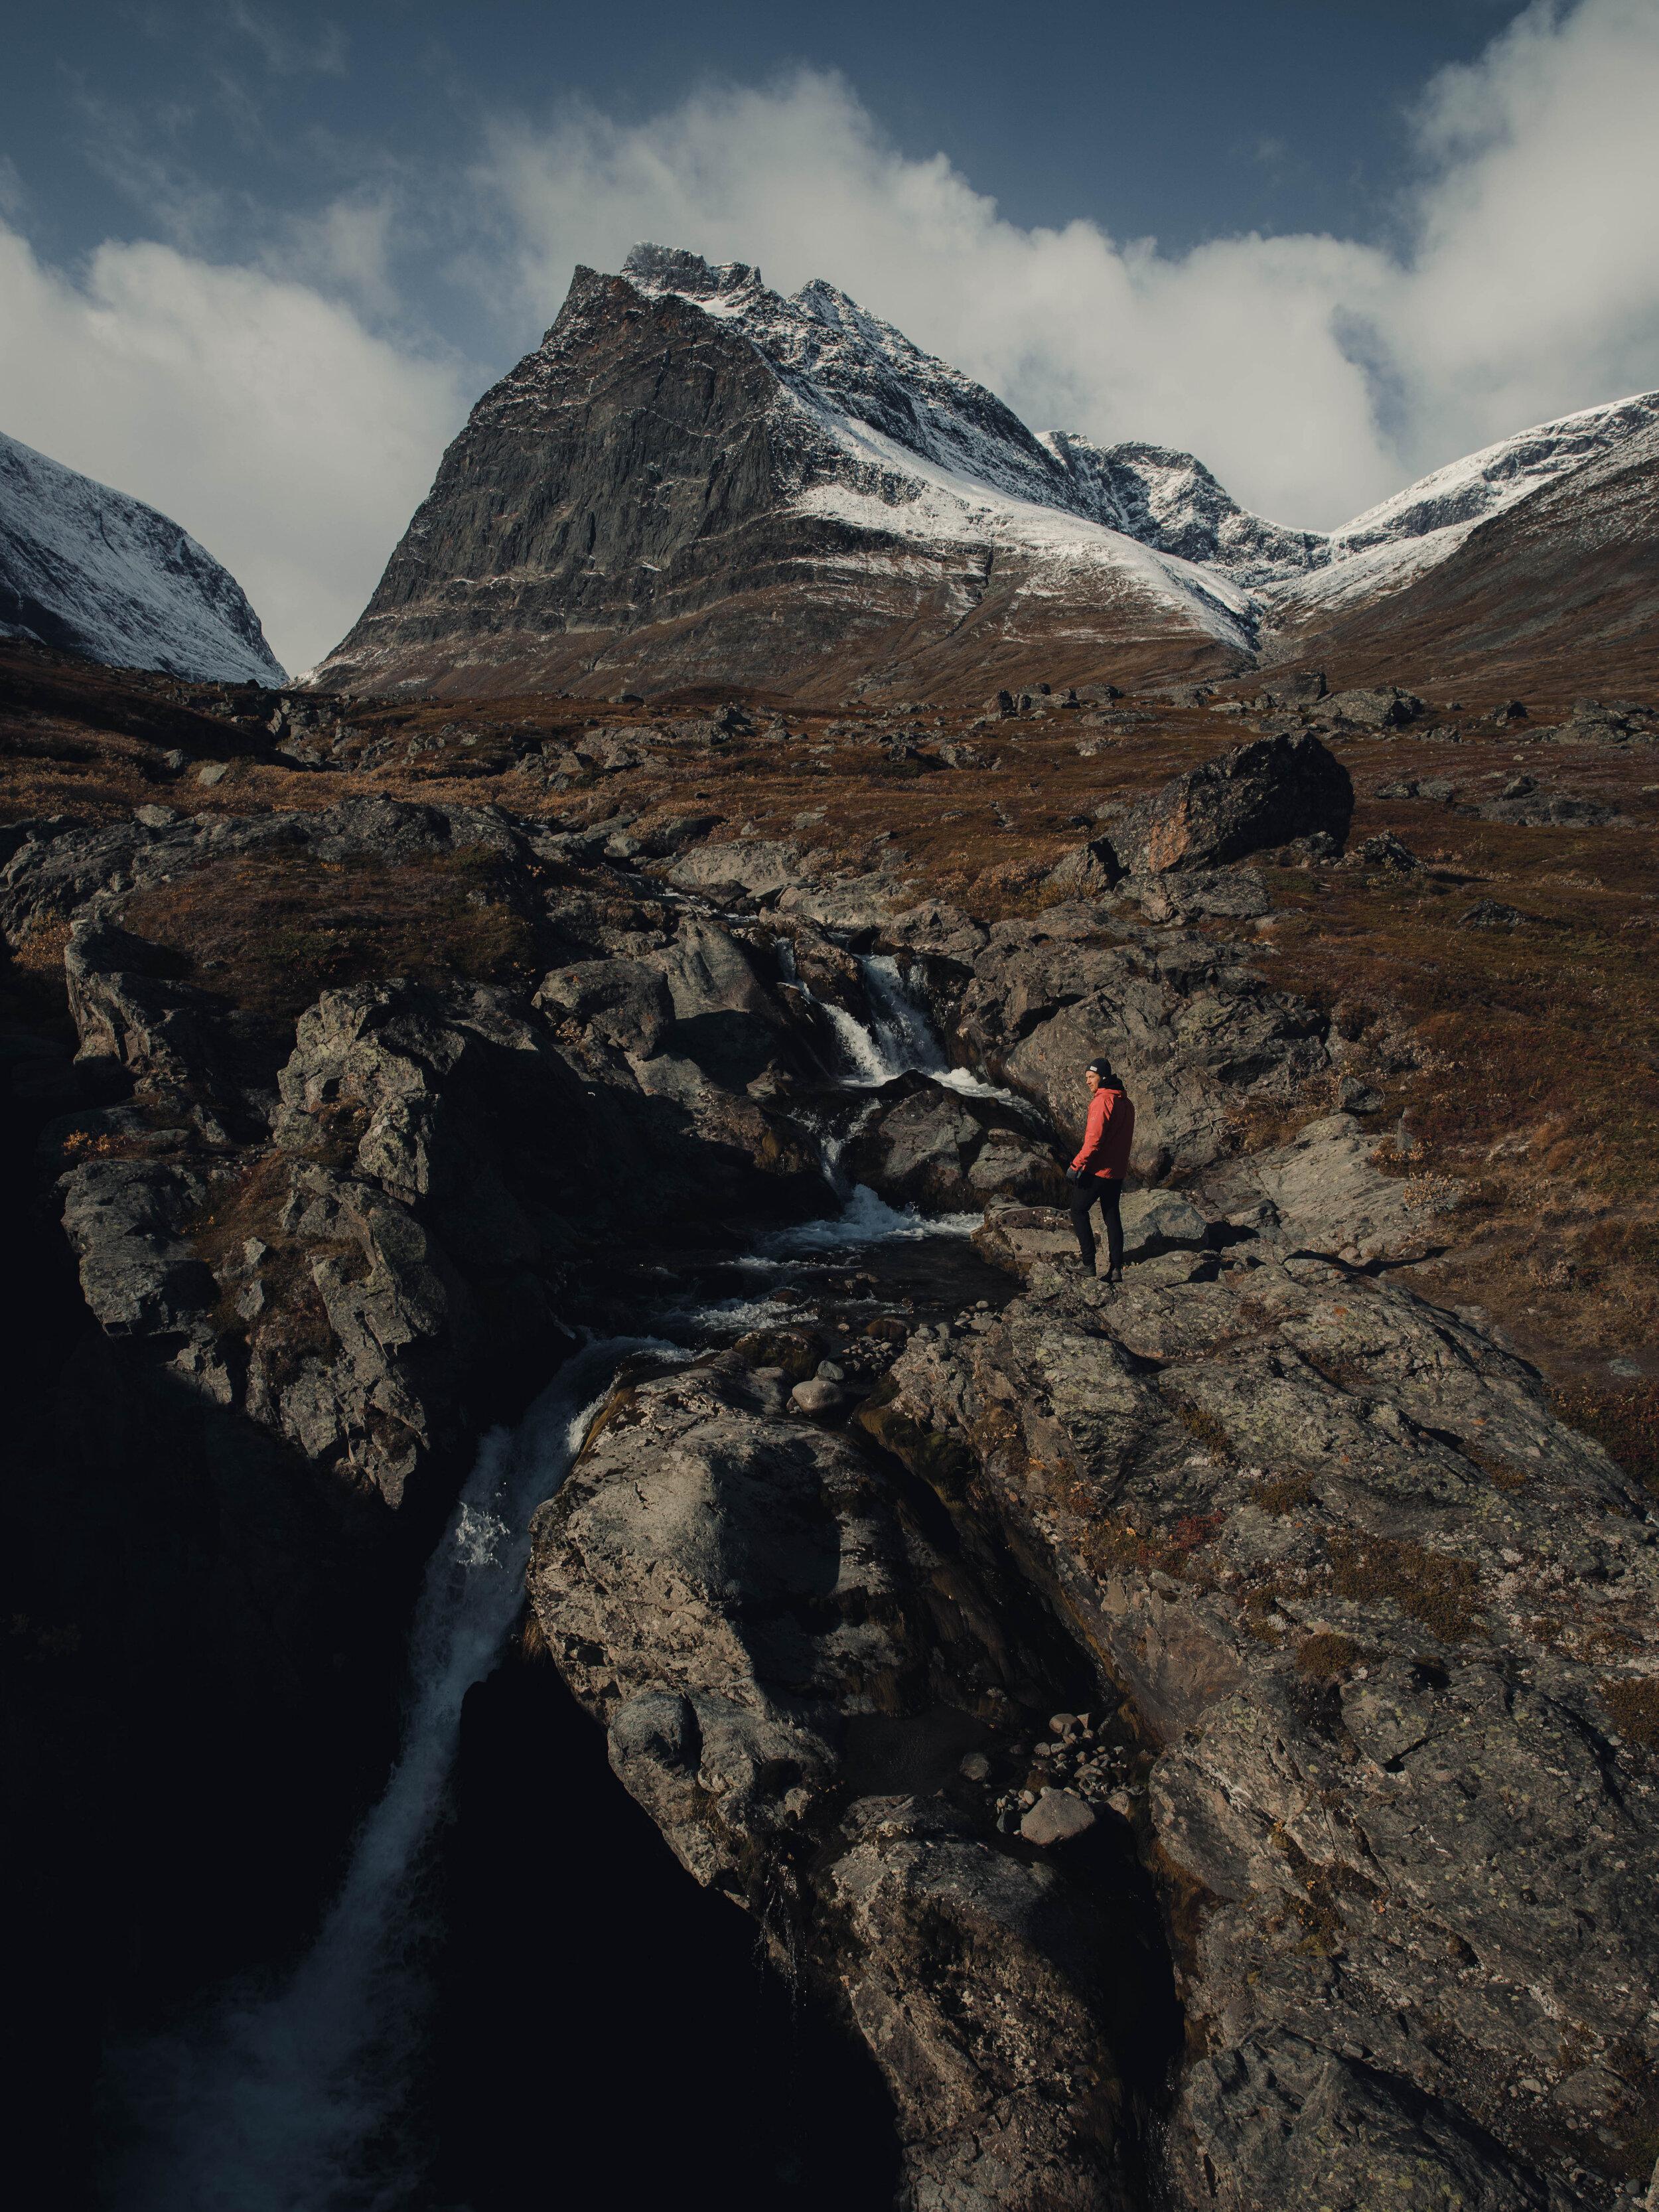 Mount Tuolpagorni with its cauldron-like looking summit.